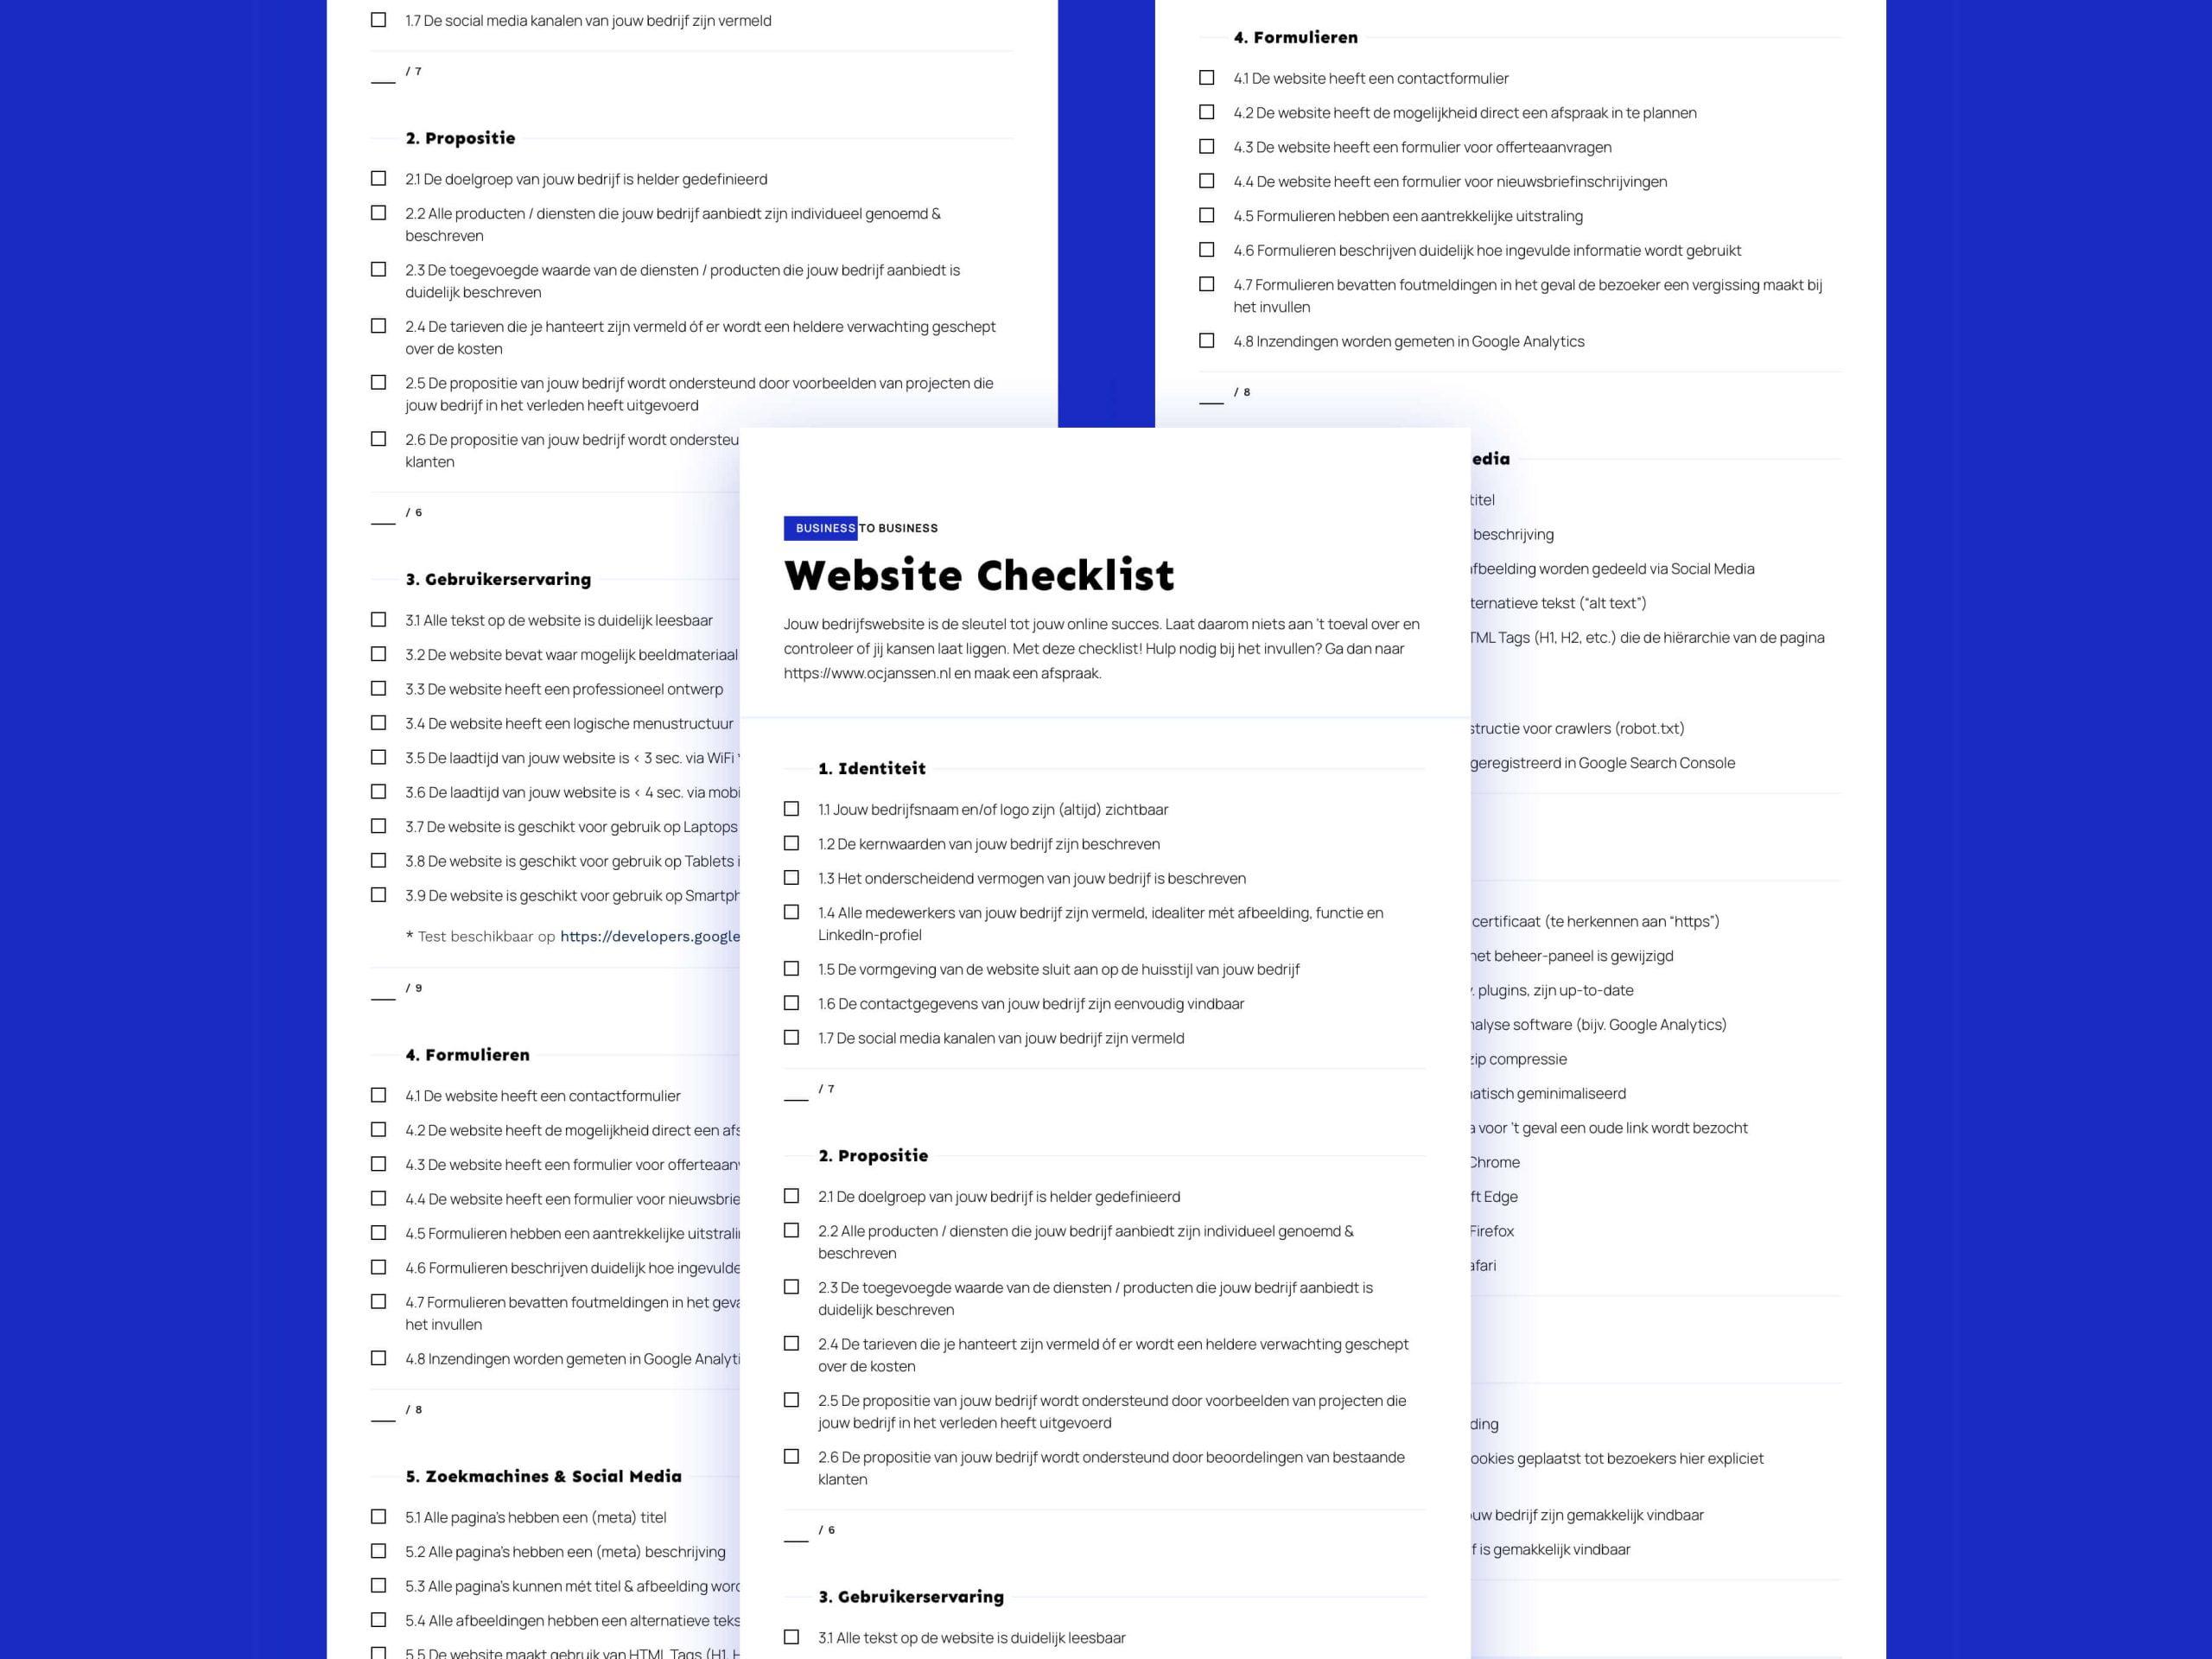 b2b-website-checklist